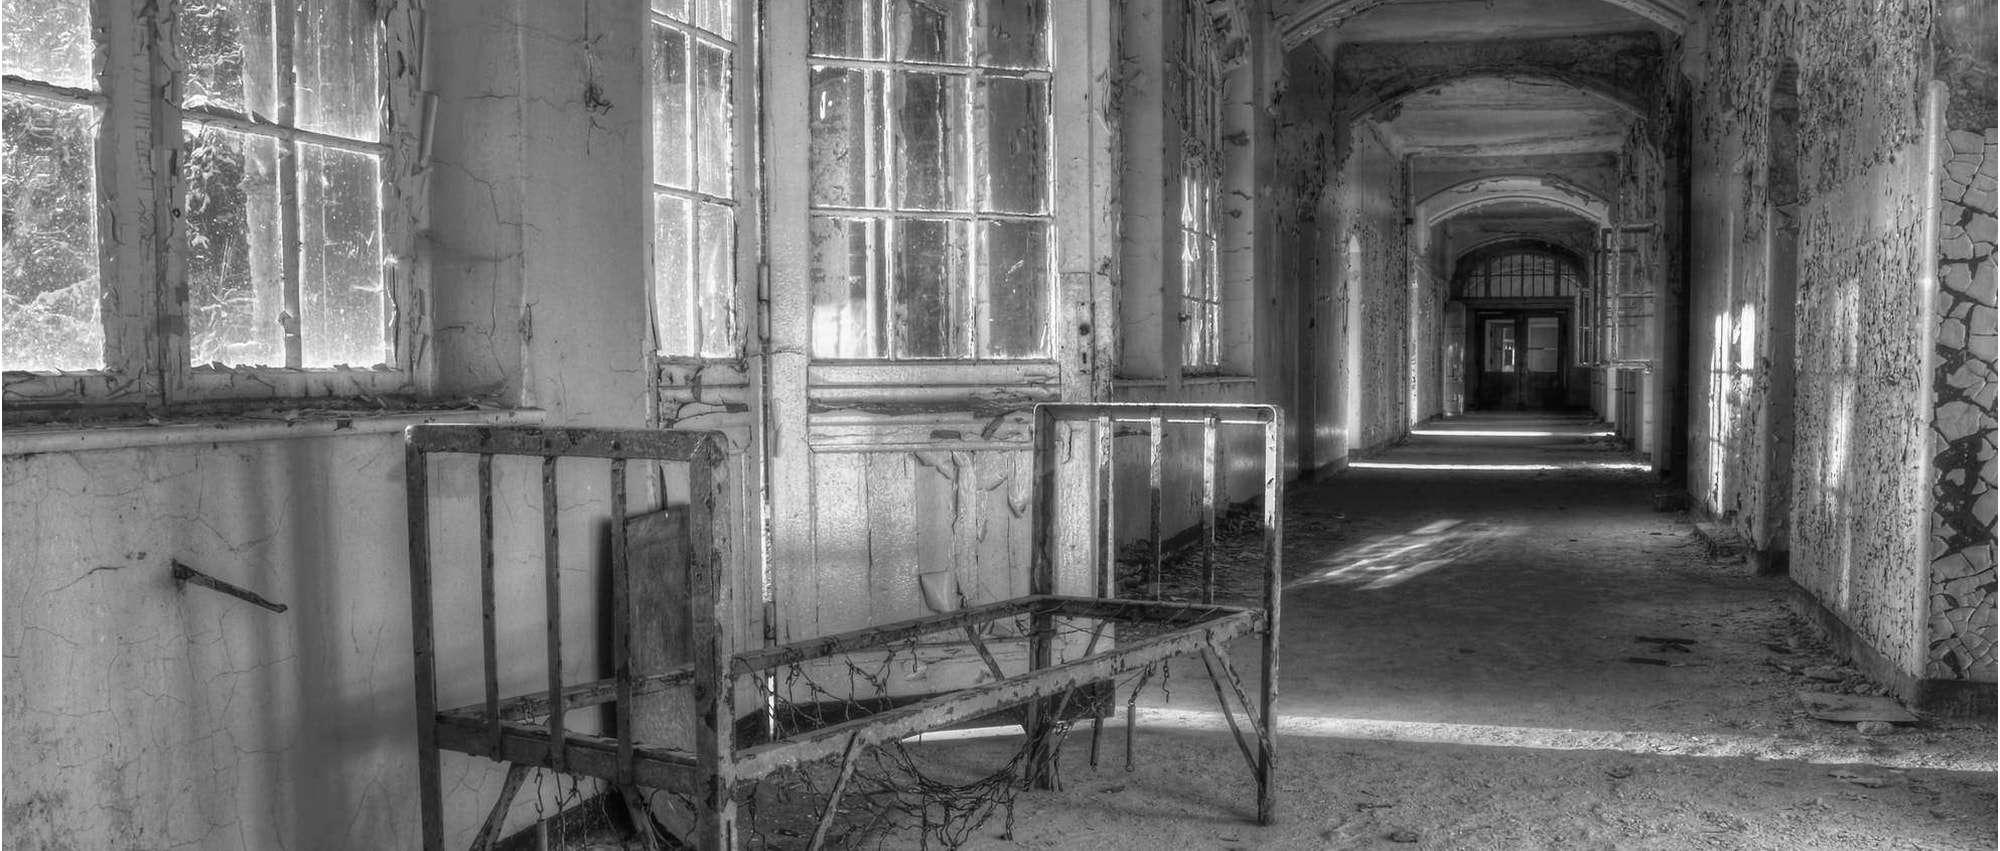 Haunted Asylum Ghost Hunts